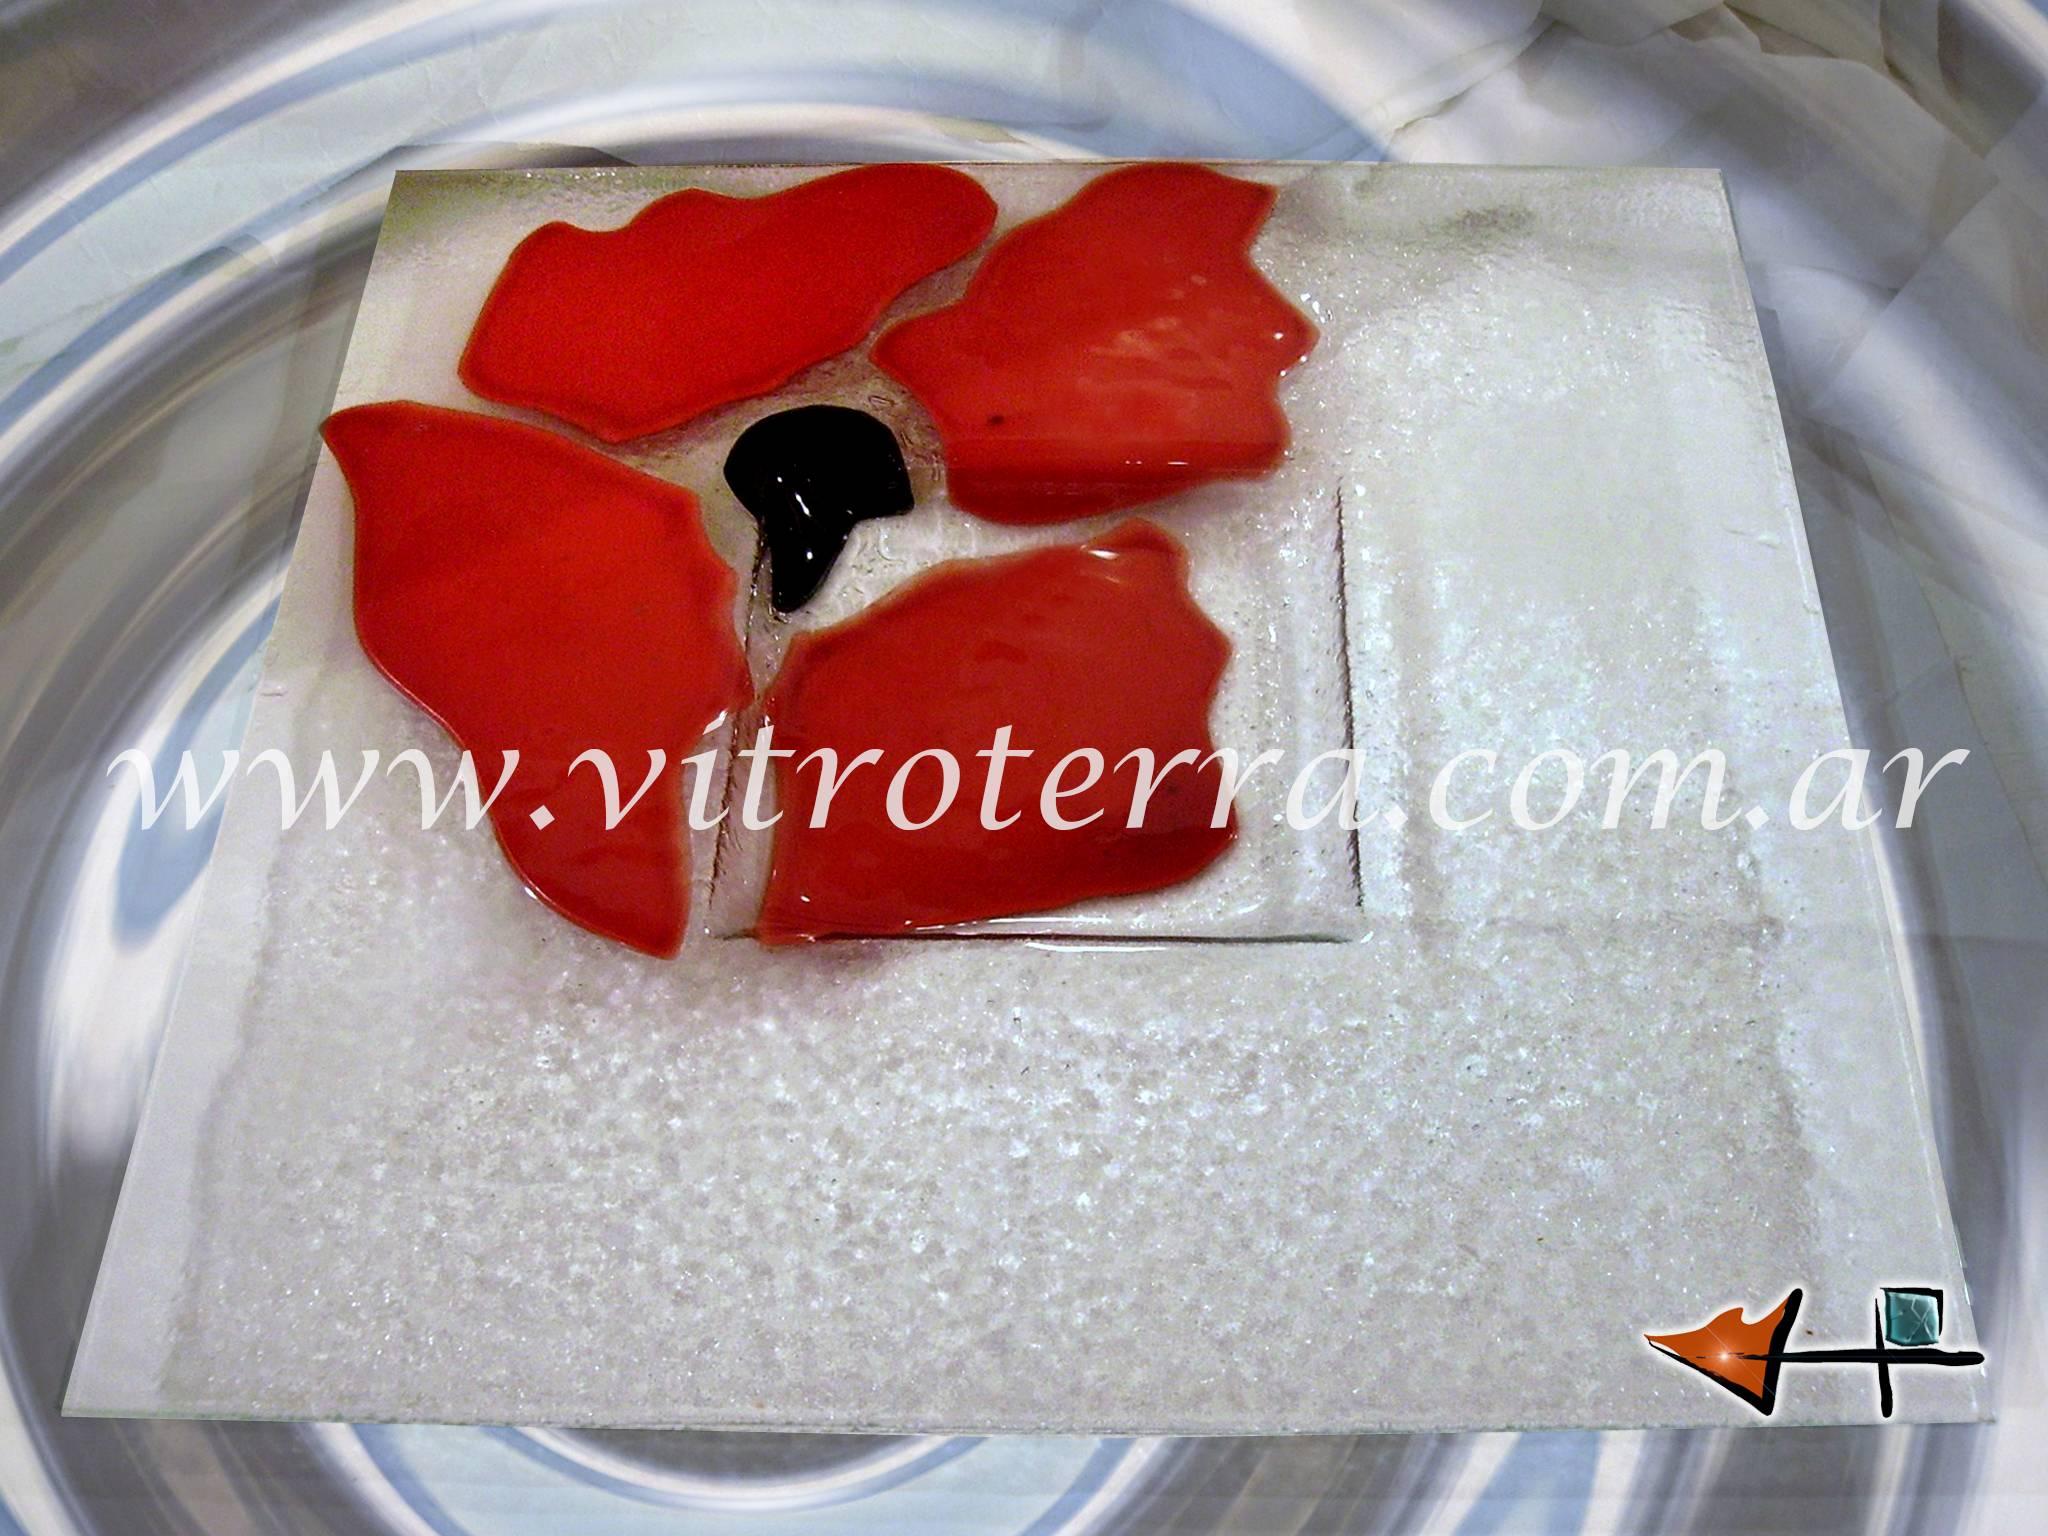 Centro cuadrado de vidrio Rosa-Roja